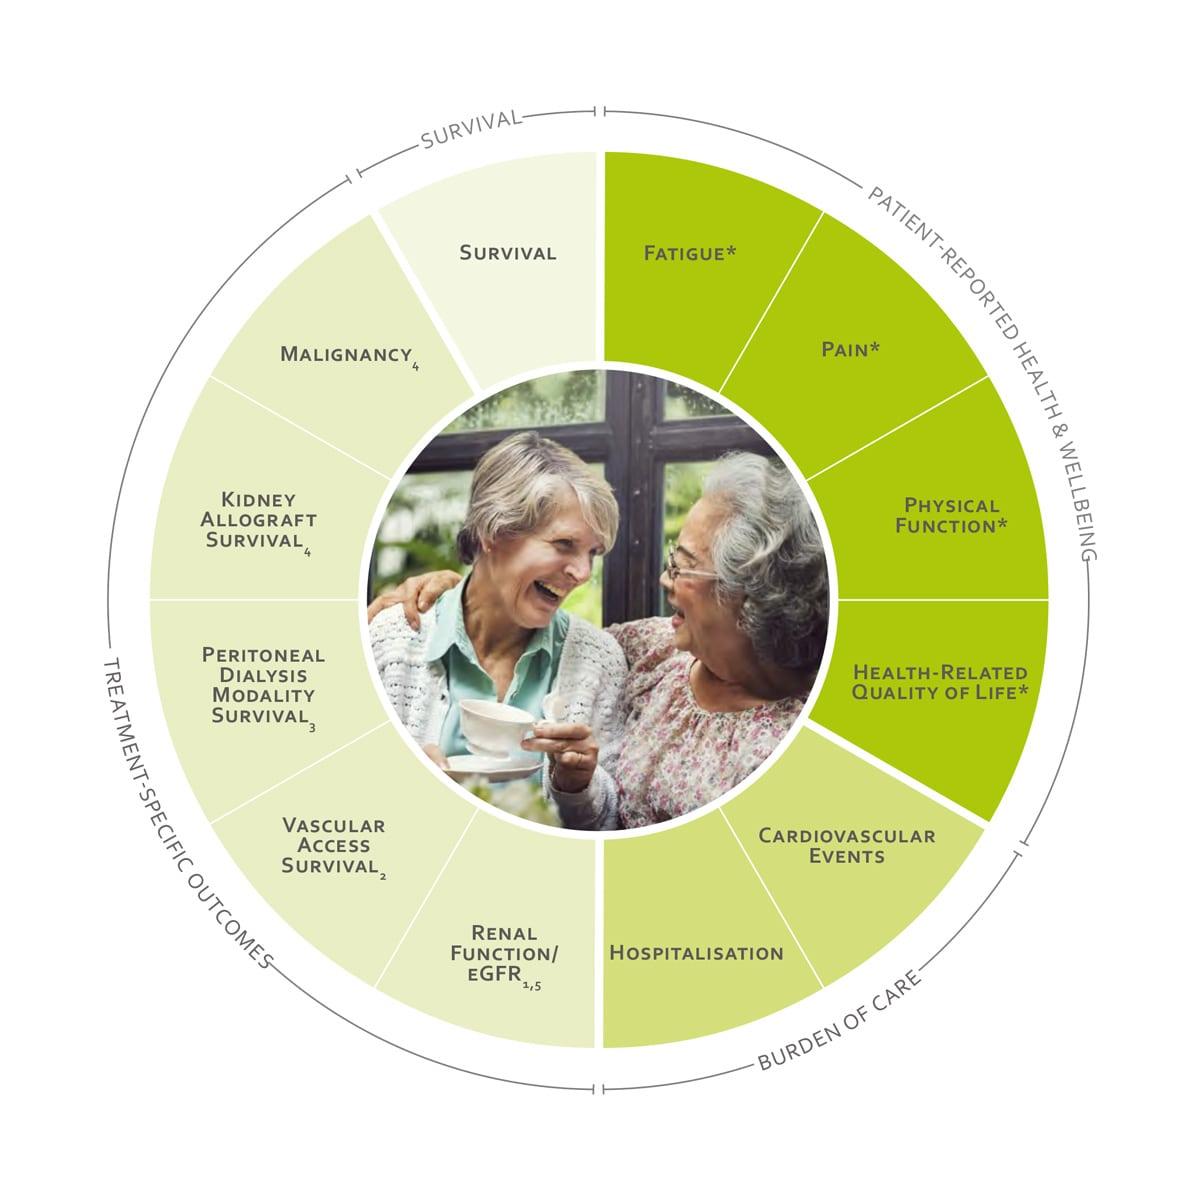 ICHOM Standard Sets Chronic Kidney Disease Outcomes Wheel